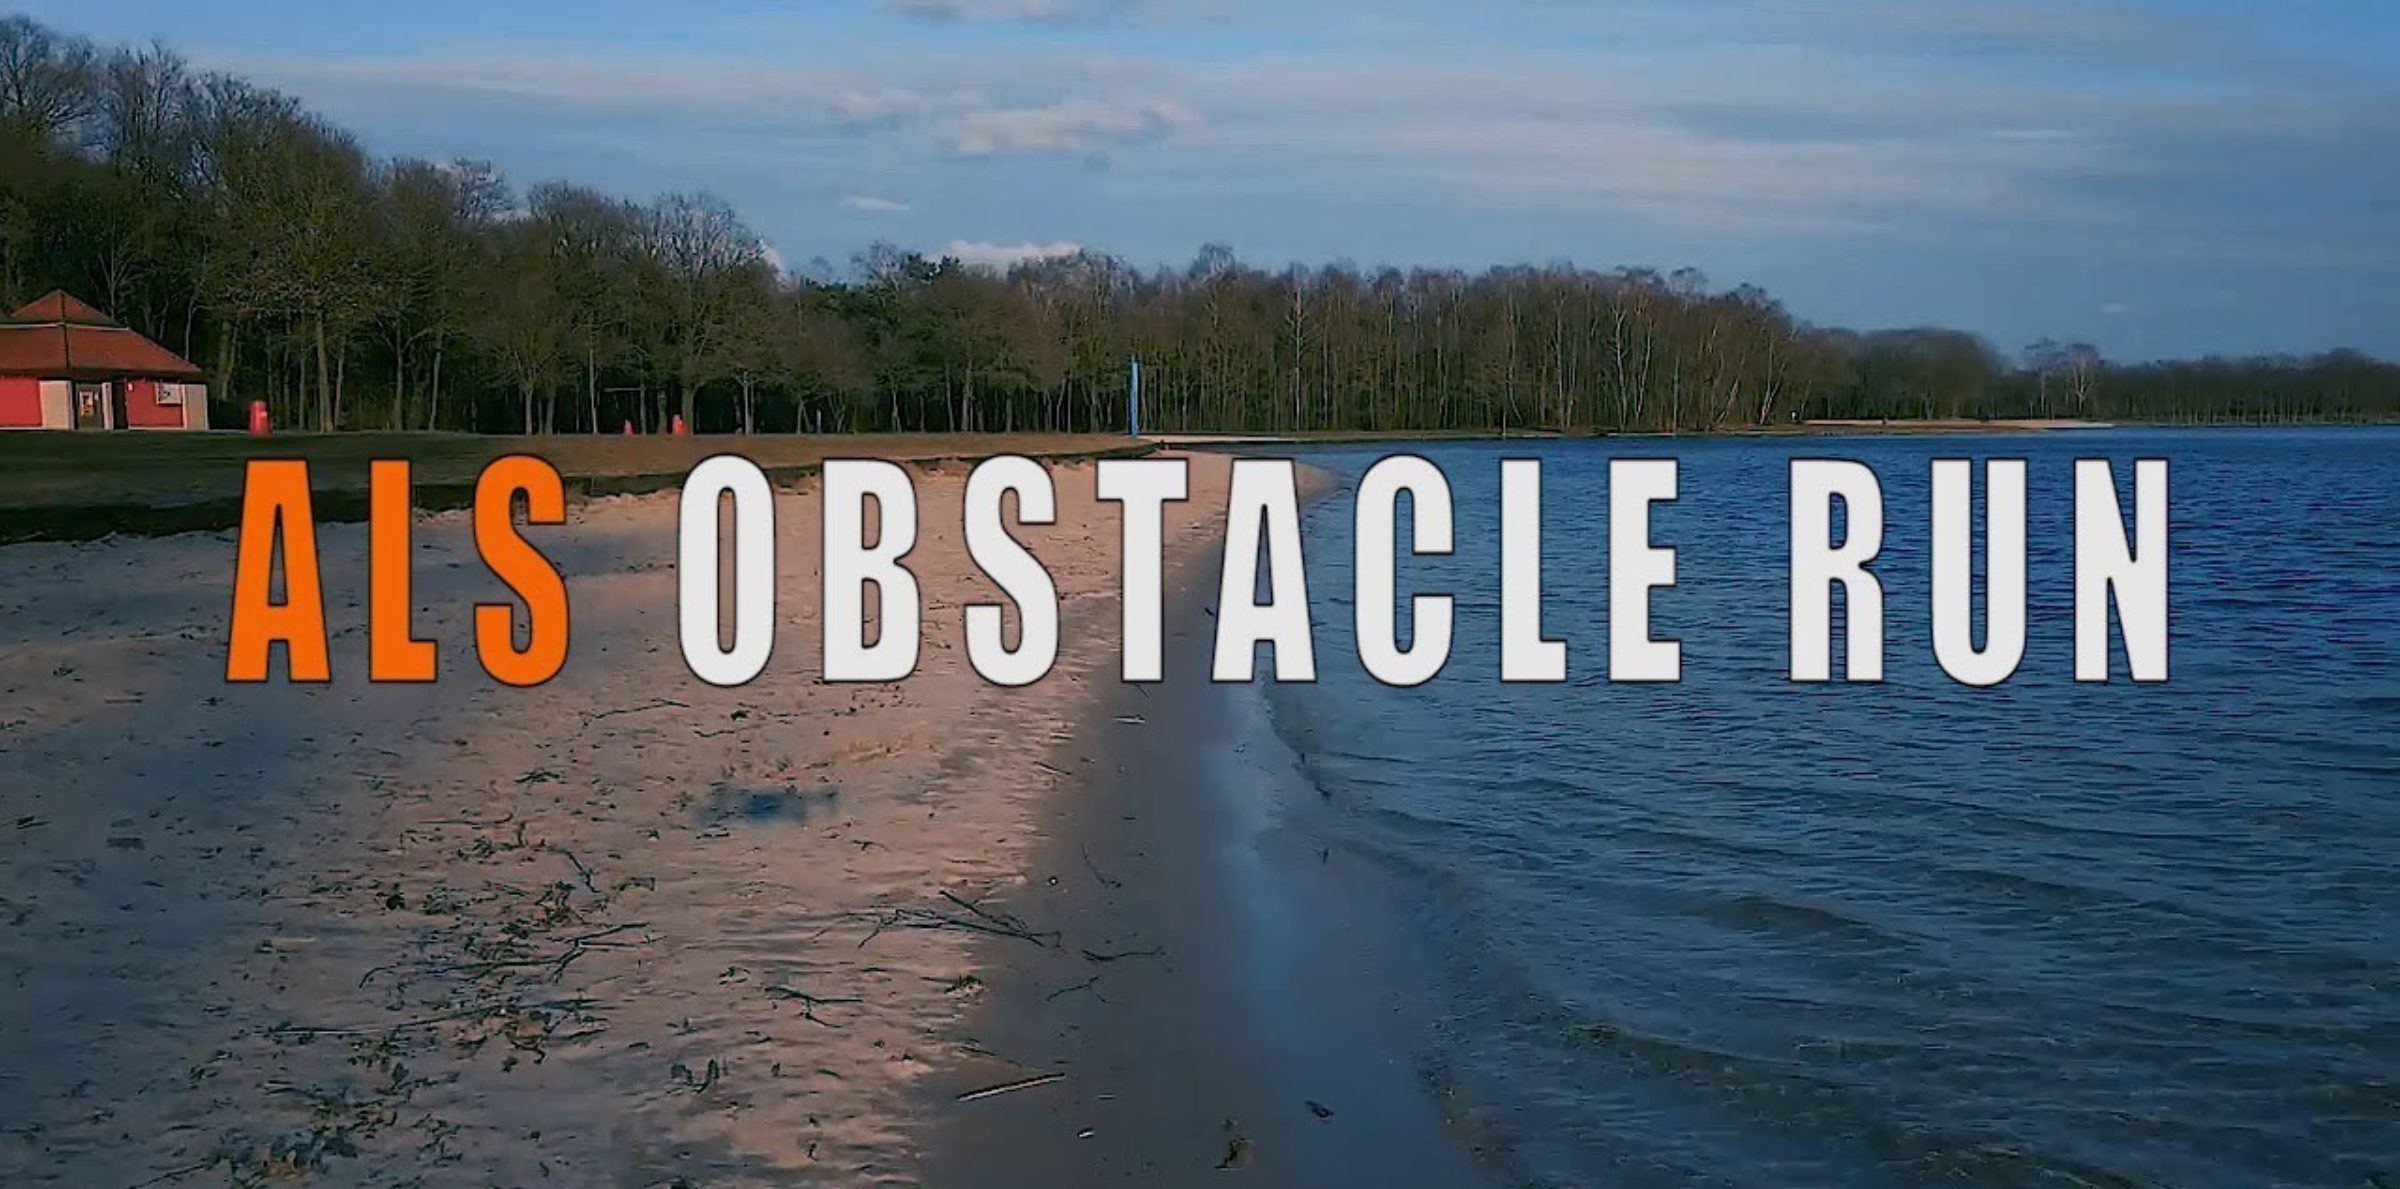 ALS Obstacle run 2391 1551946543 35hxe9rujf